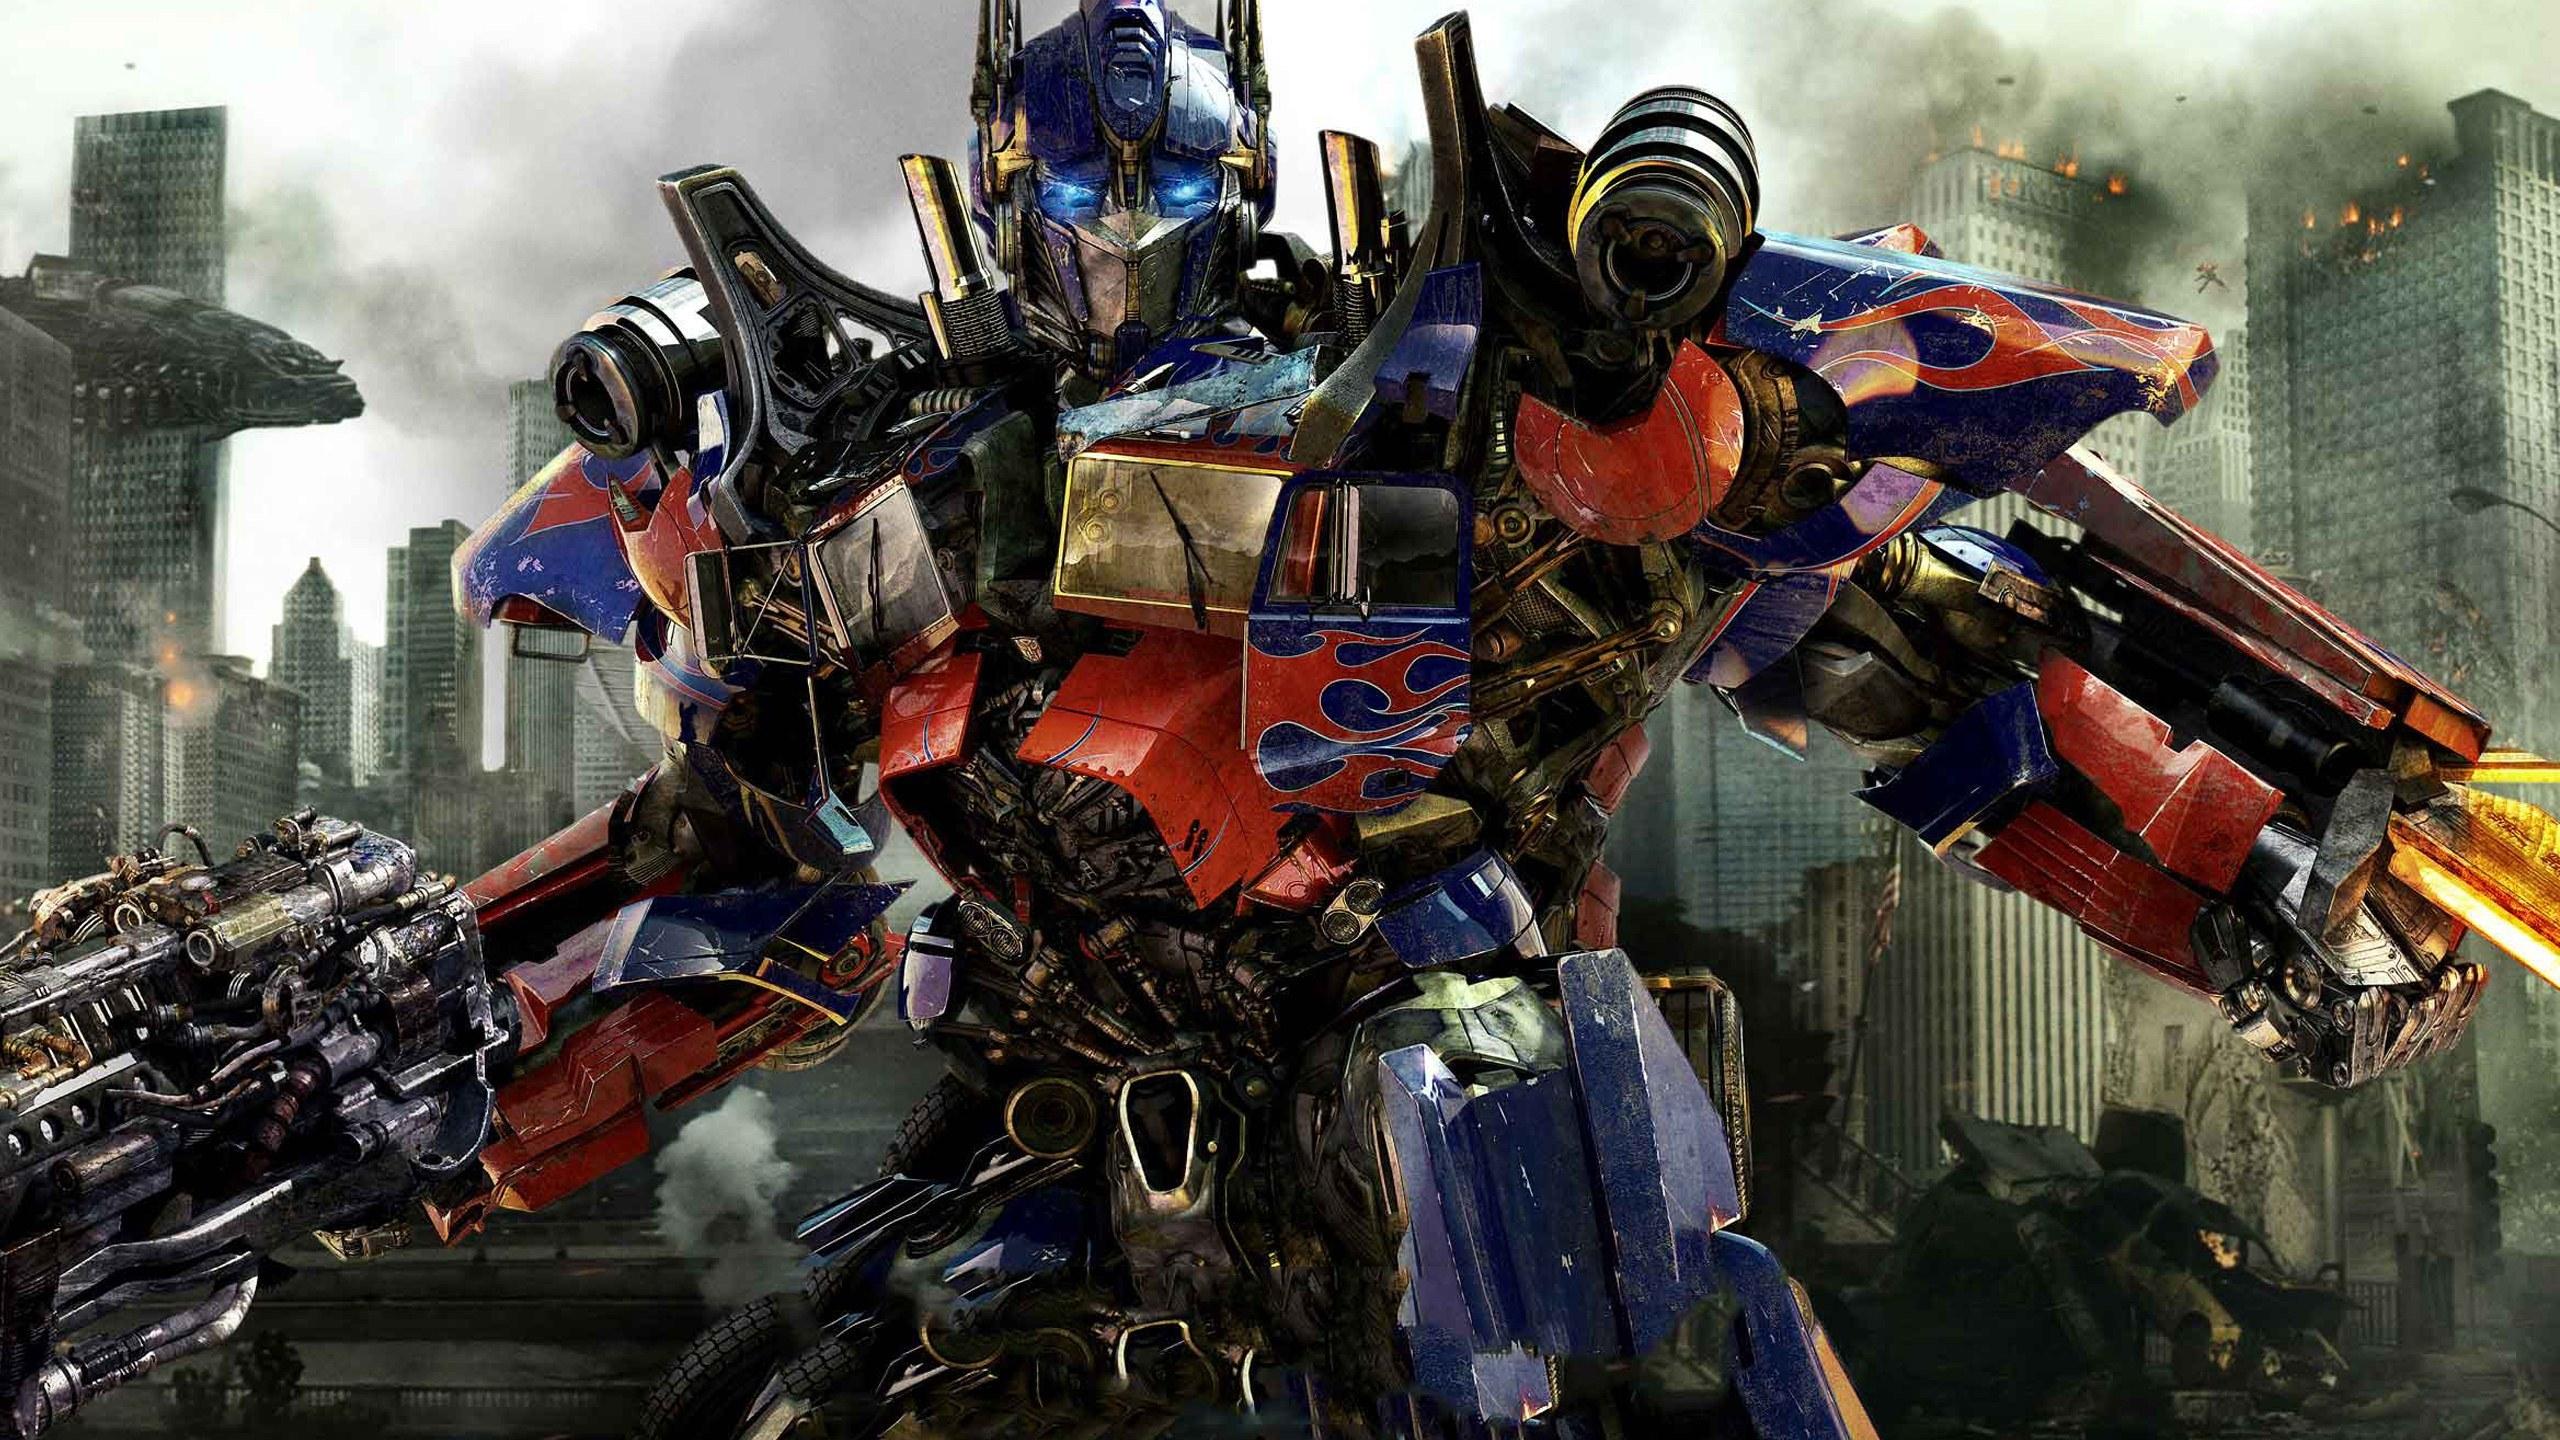 Michael Bay reageert op kritiek 'Transformers: Age of Extinction'